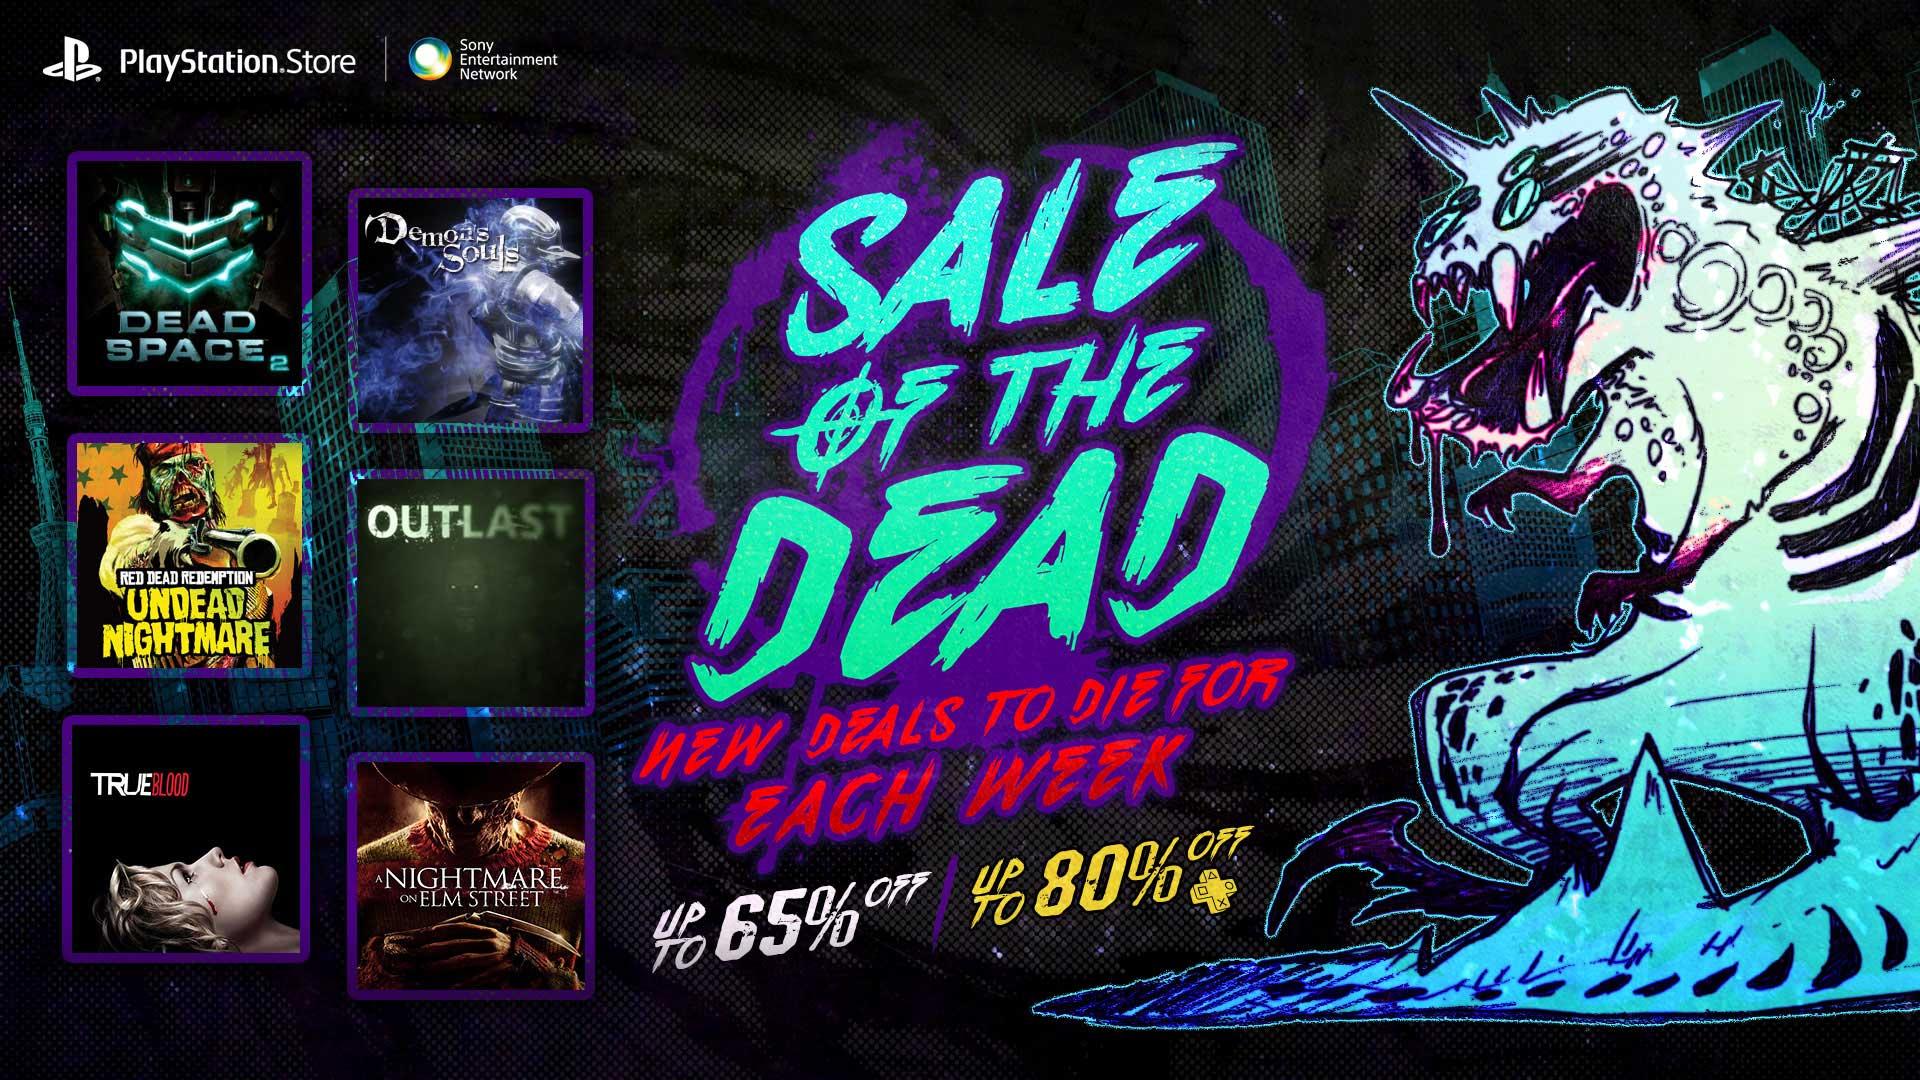 psn_halloween_sale_of_the_dead